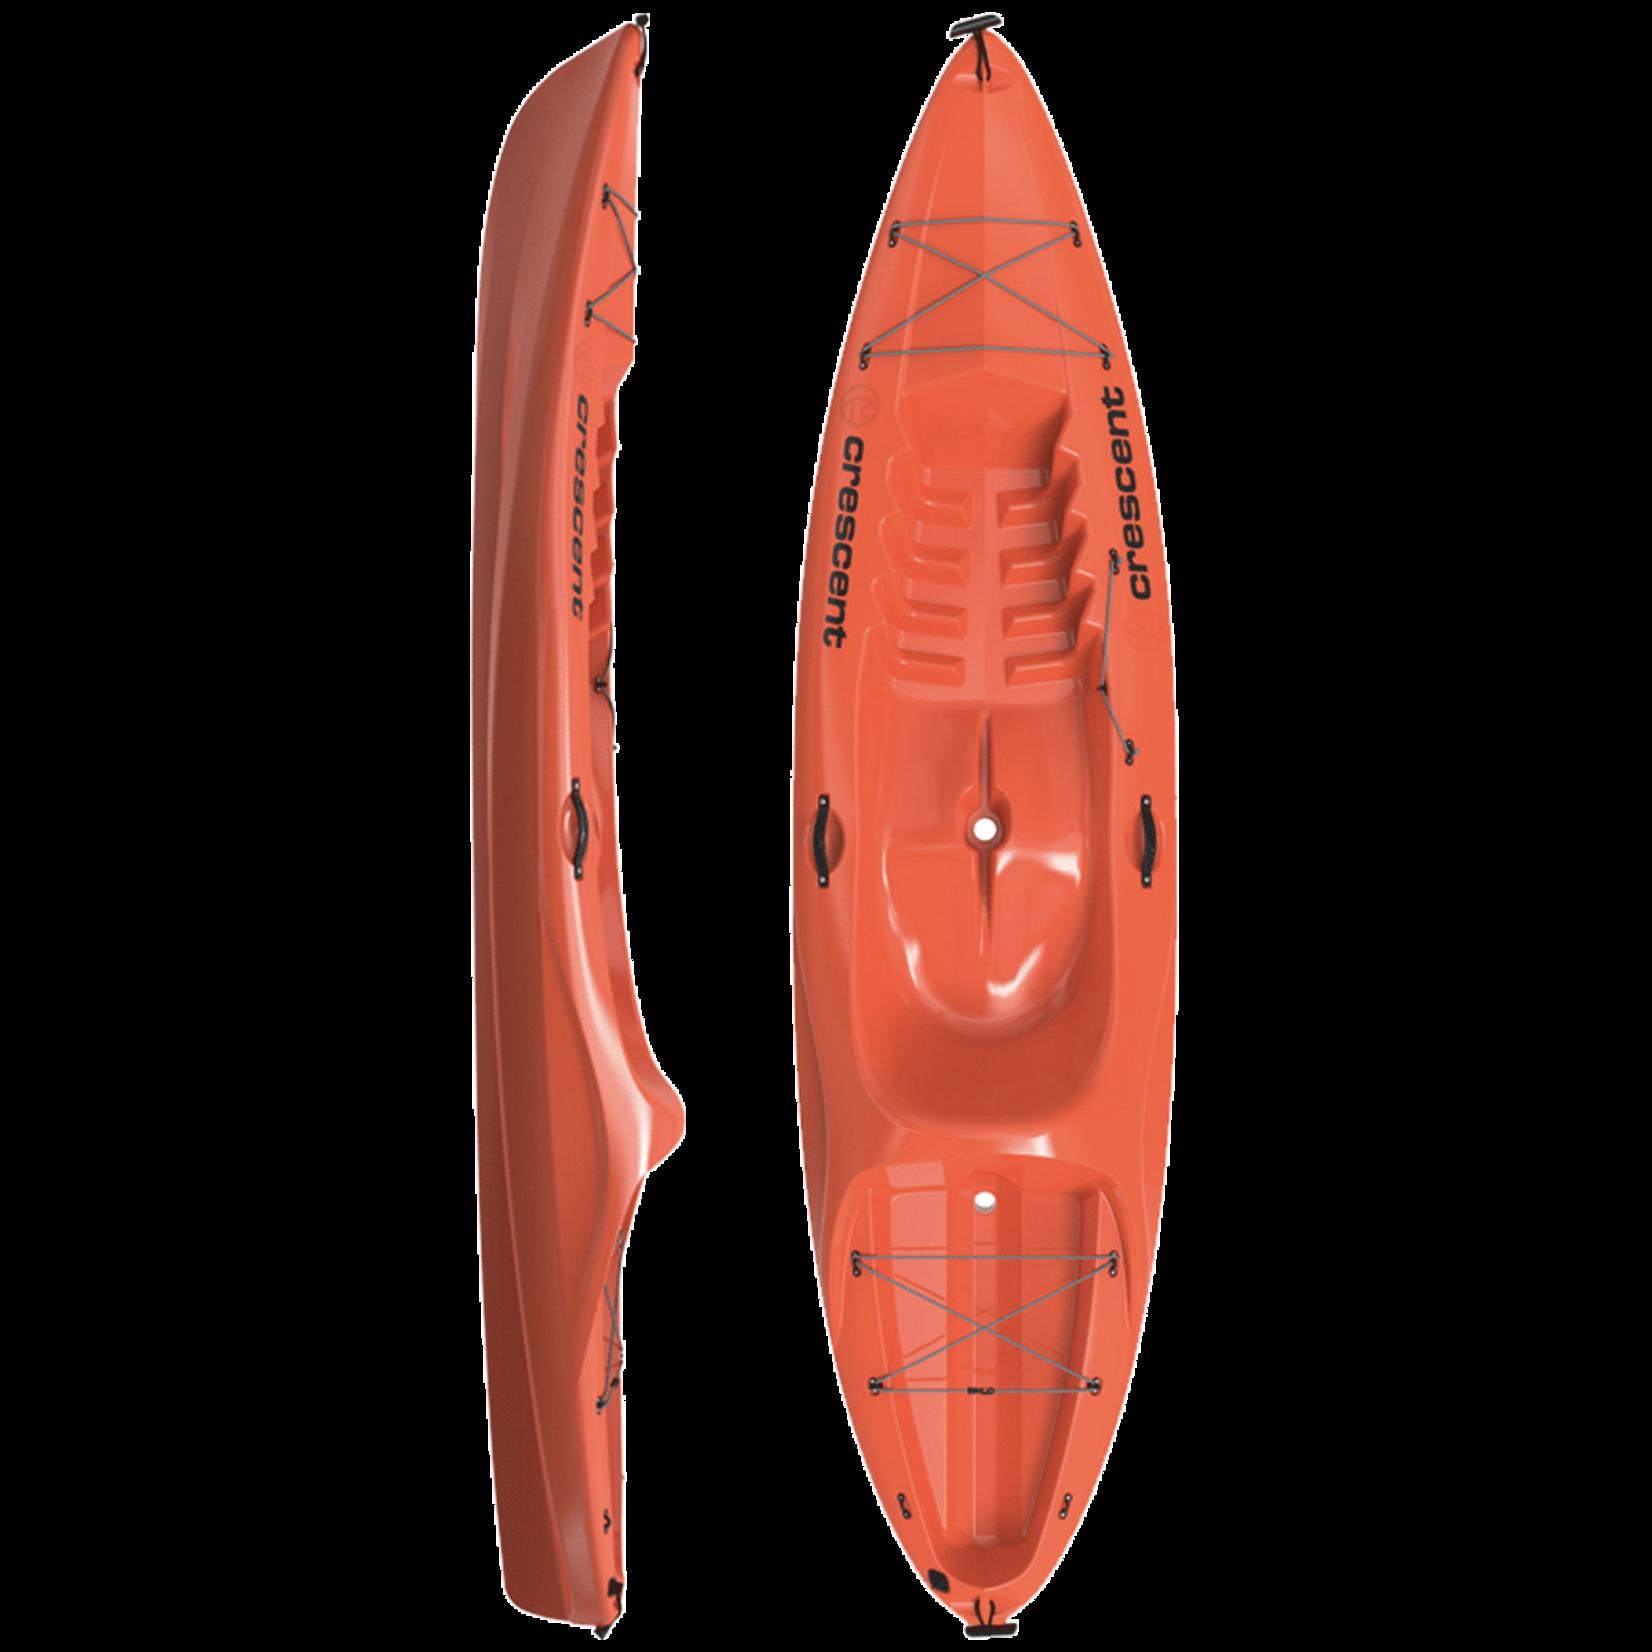 Crescent Kayaks Crescent Splashback